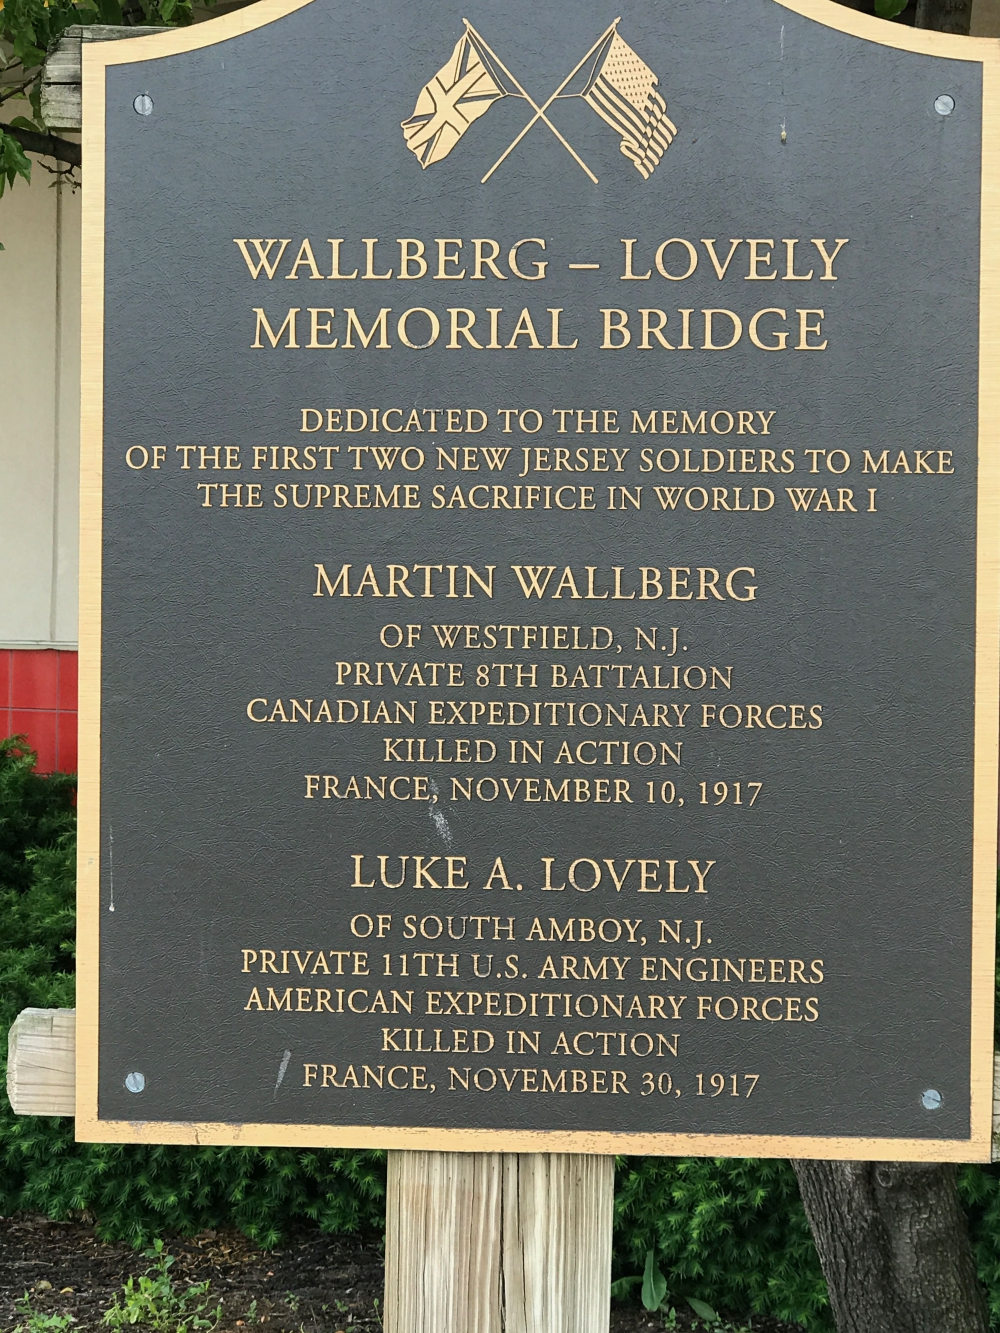 Wallberg-Lovely Bridge